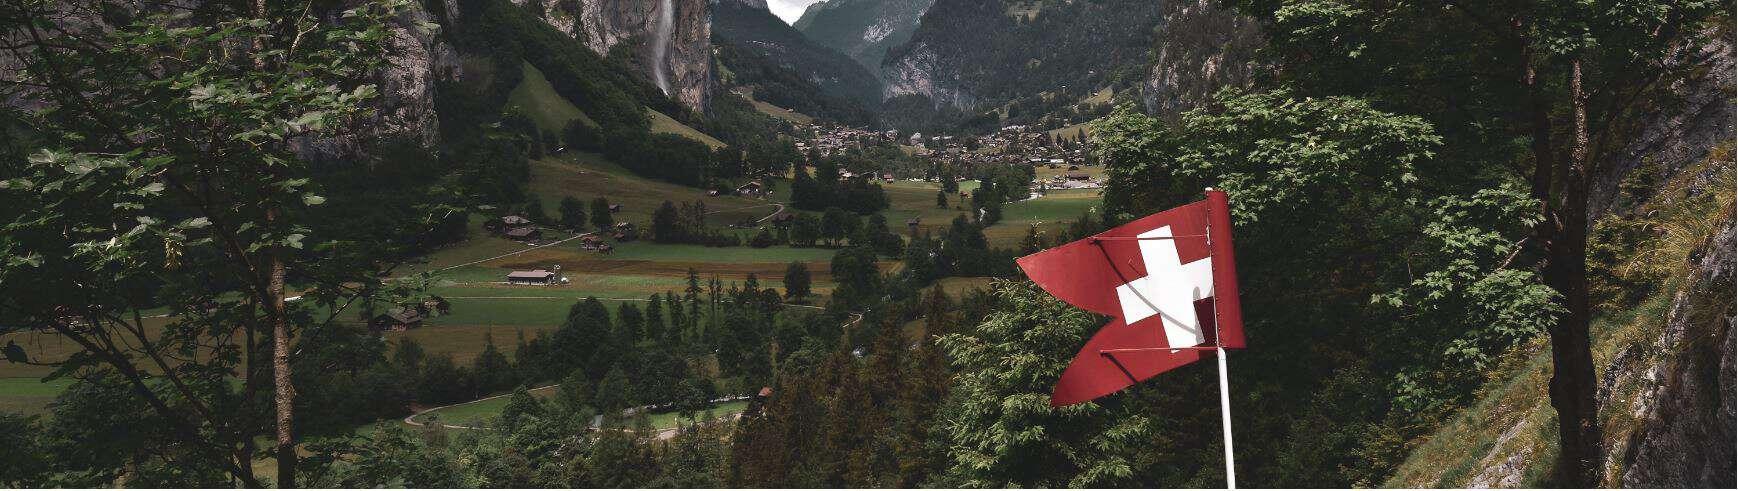 Liste Private Equity Fonds Schweiz Datenbank Beteiligungsunternehmen